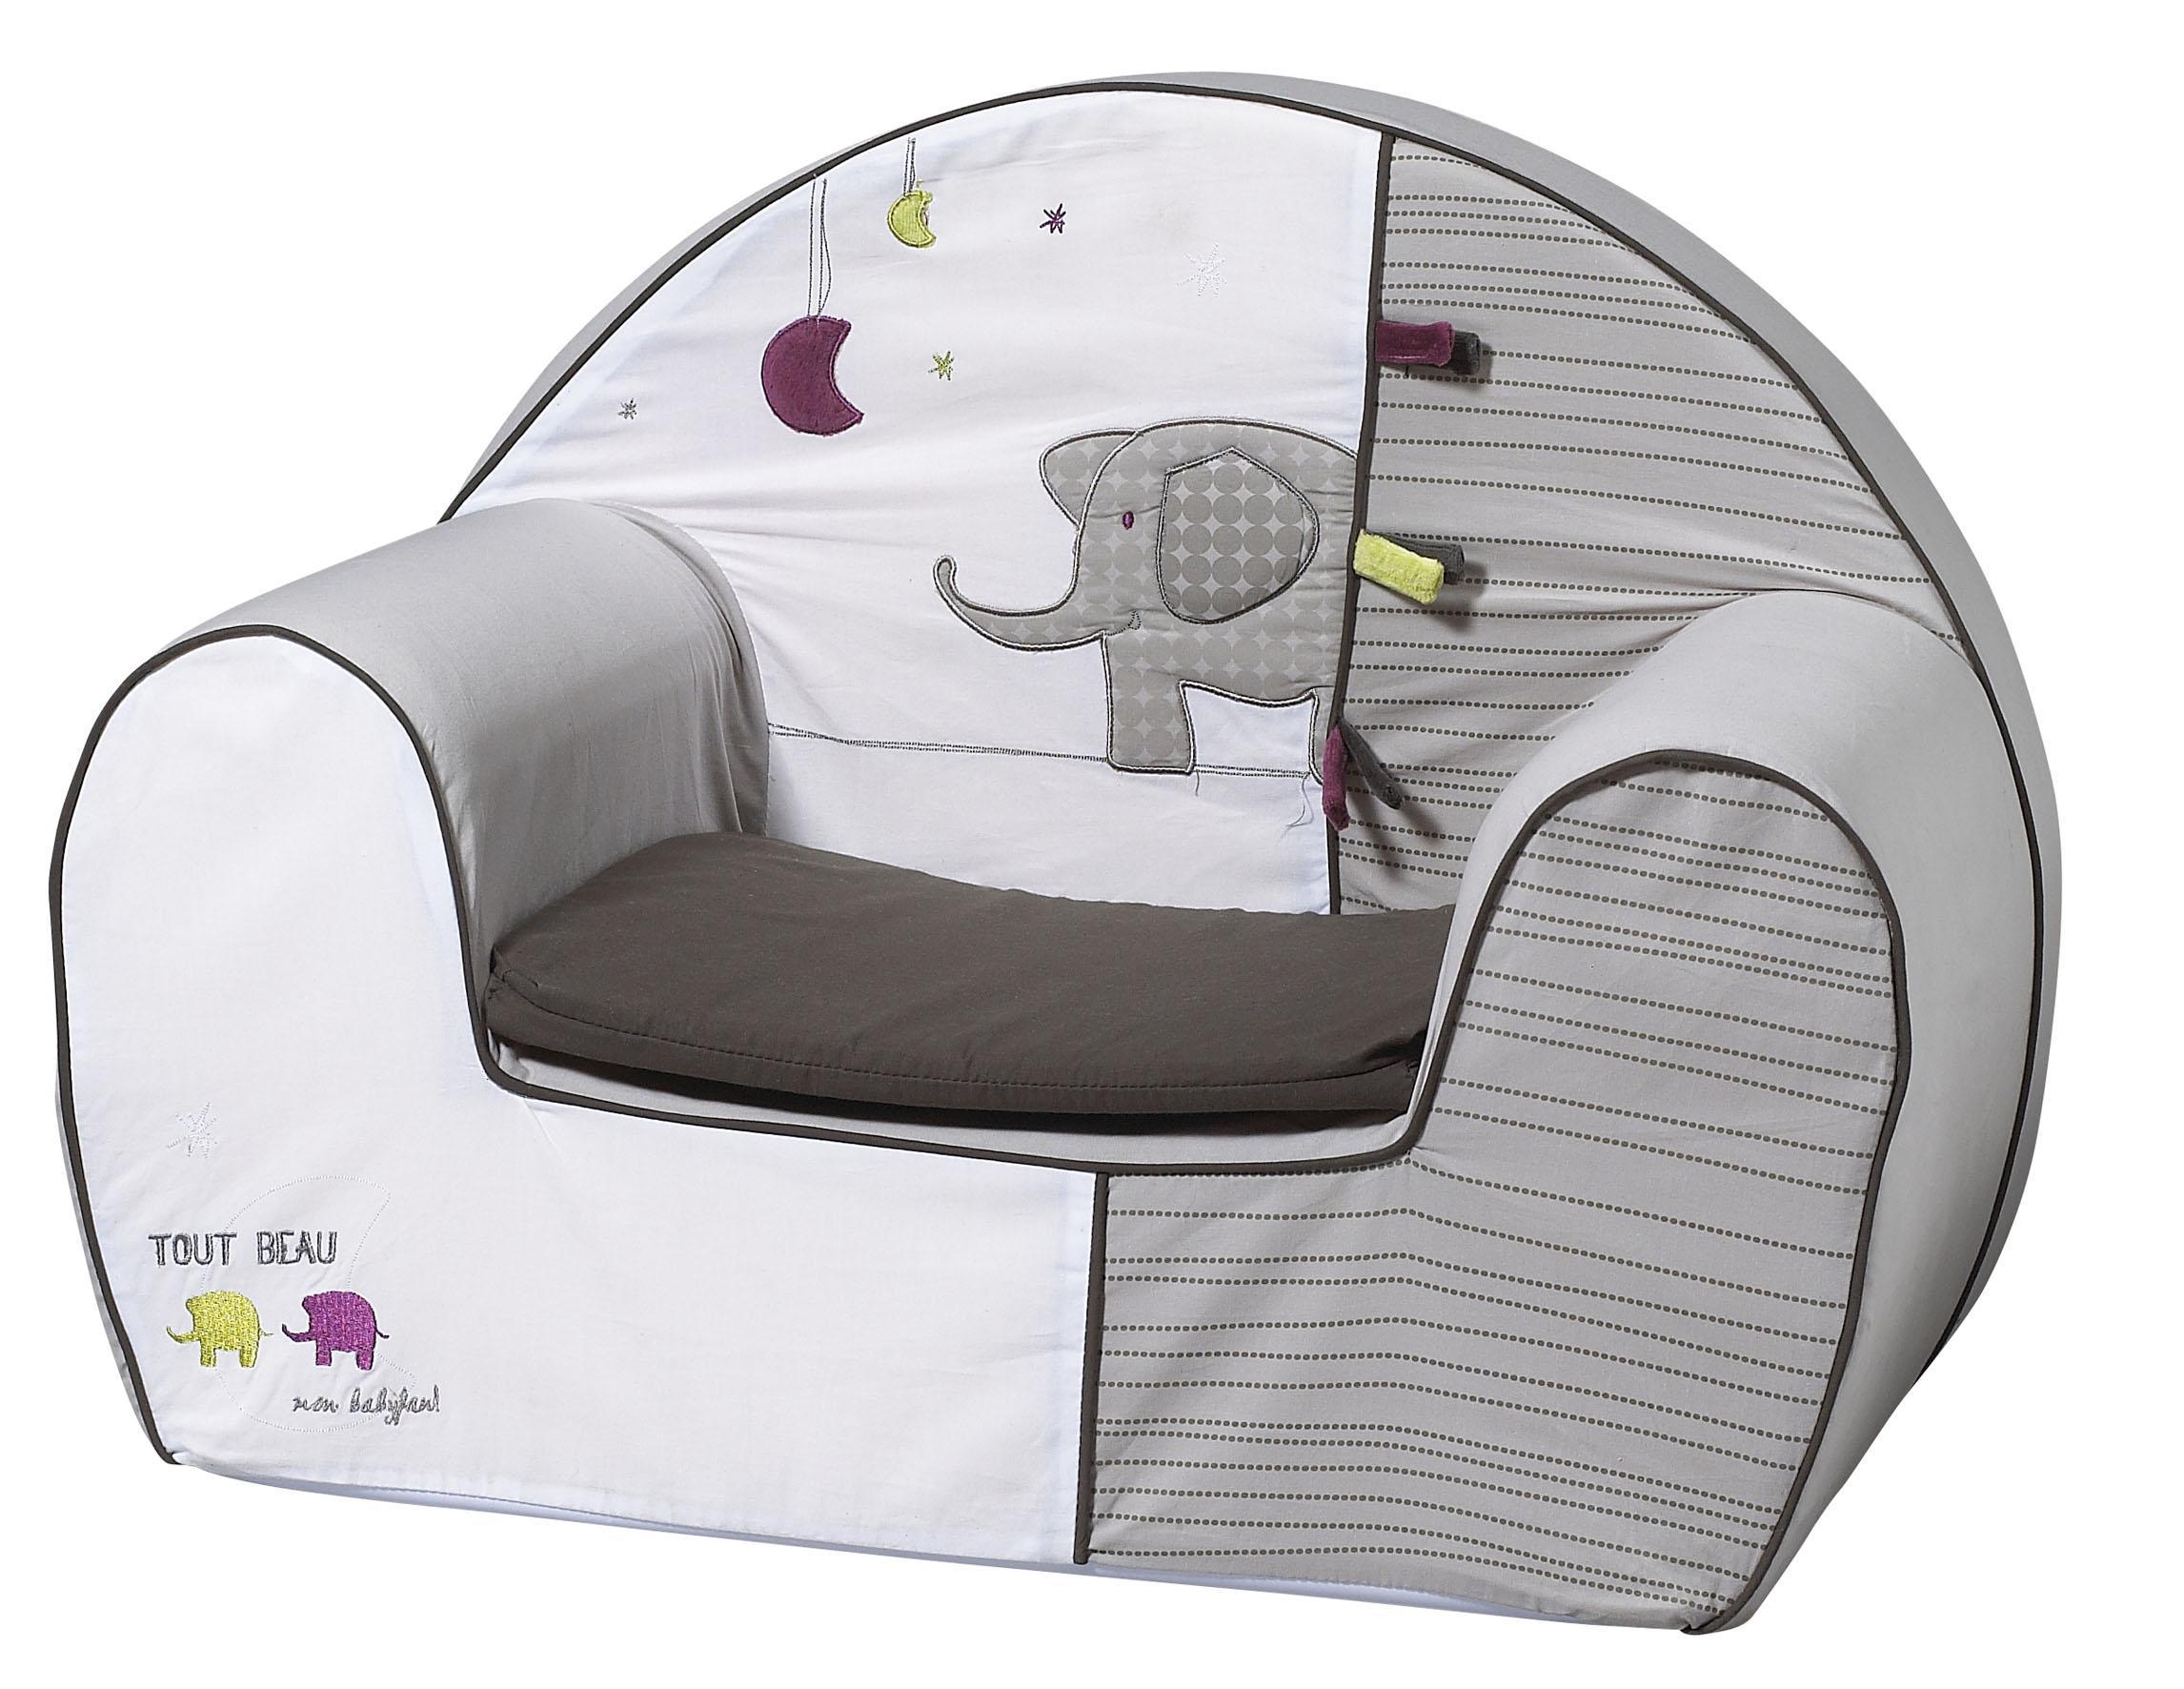 fauteuil mousse bebe. Black Bedroom Furniture Sets. Home Design Ideas